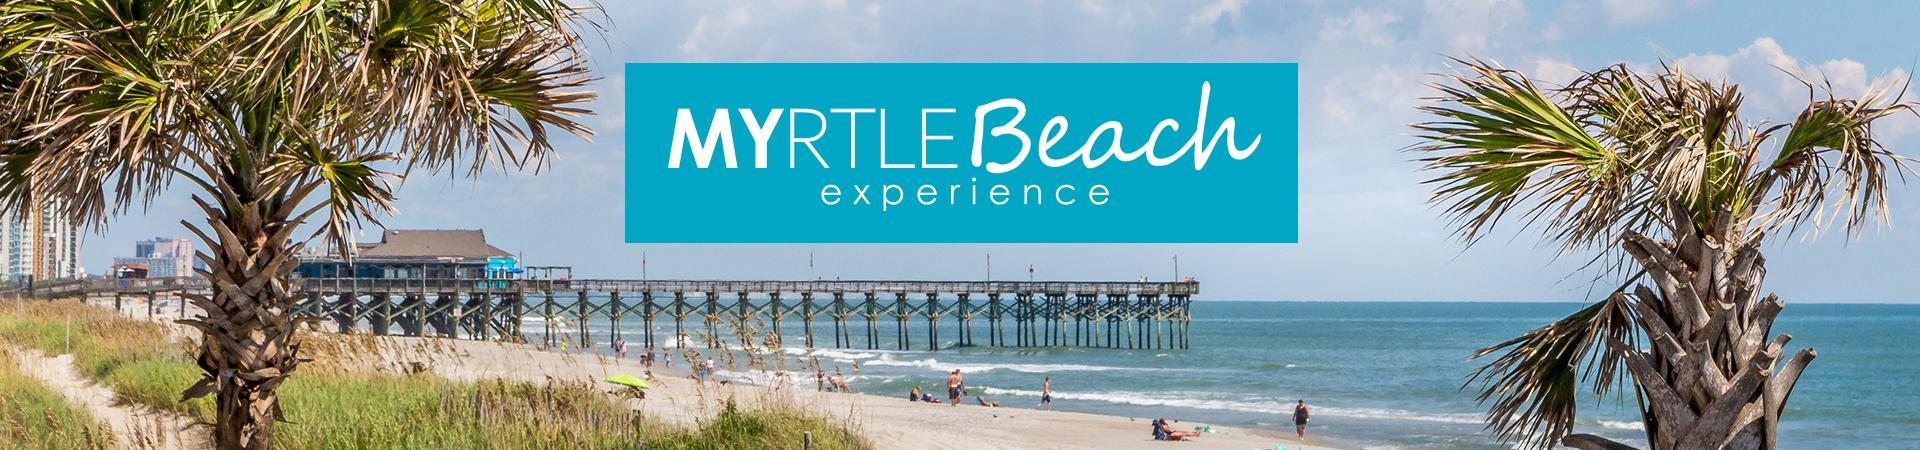 my_beach_experience_1920x450